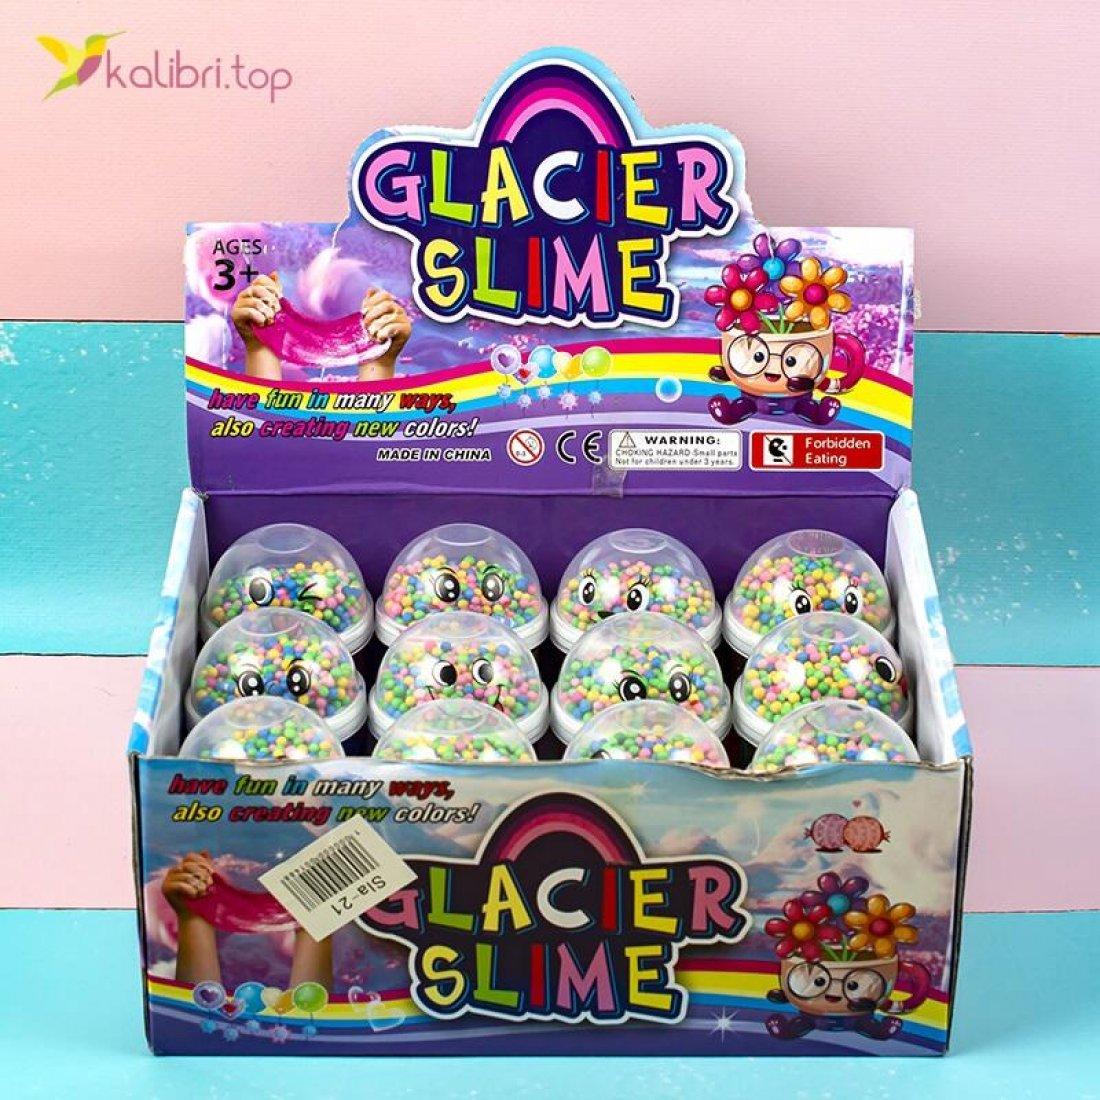 Купить слайм Glacier Slime Sla-21 оптом фото 45